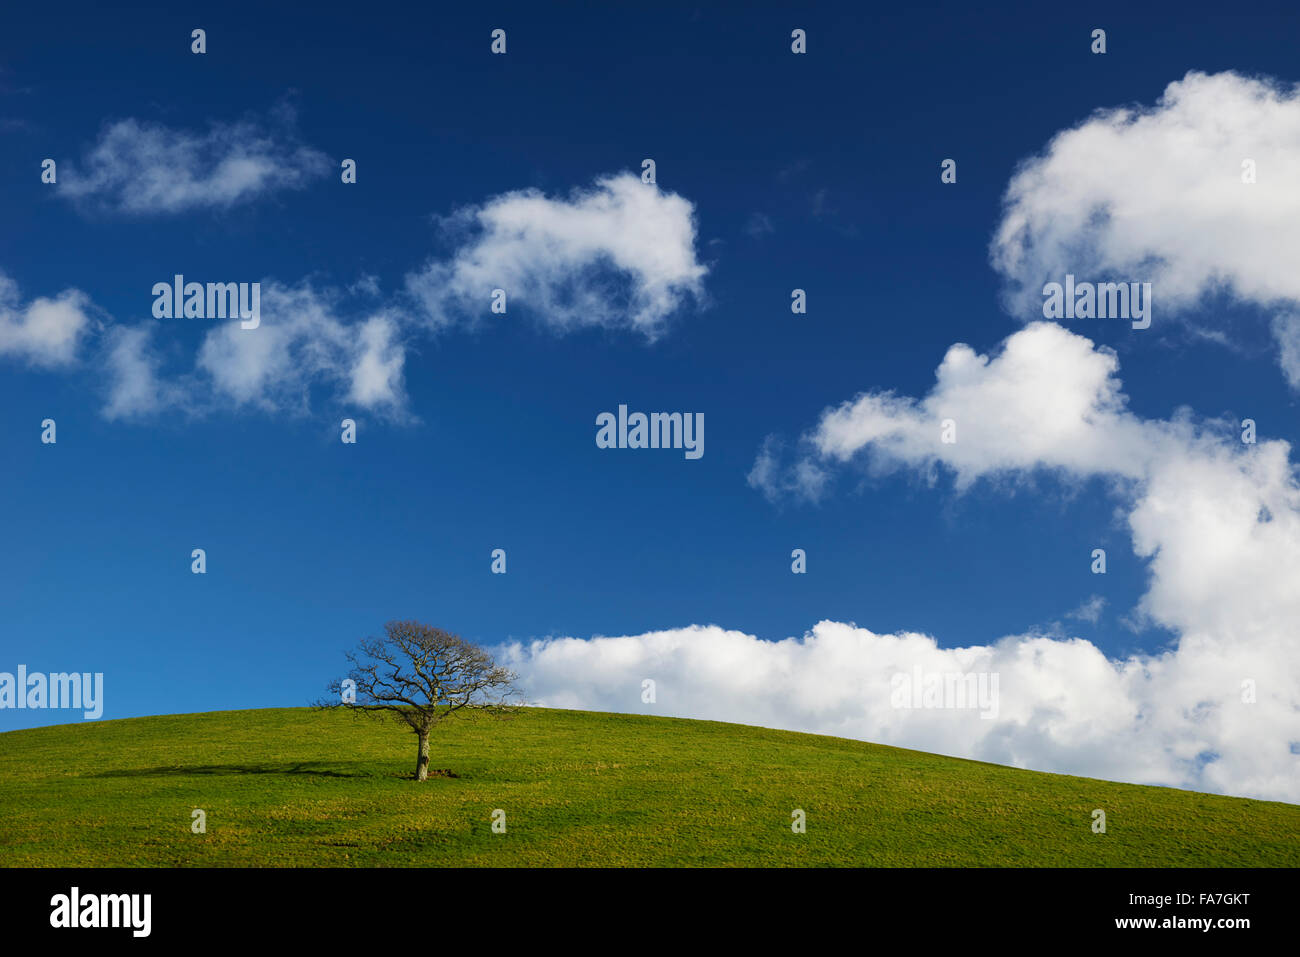 A single tree on a hillside - Stock Image